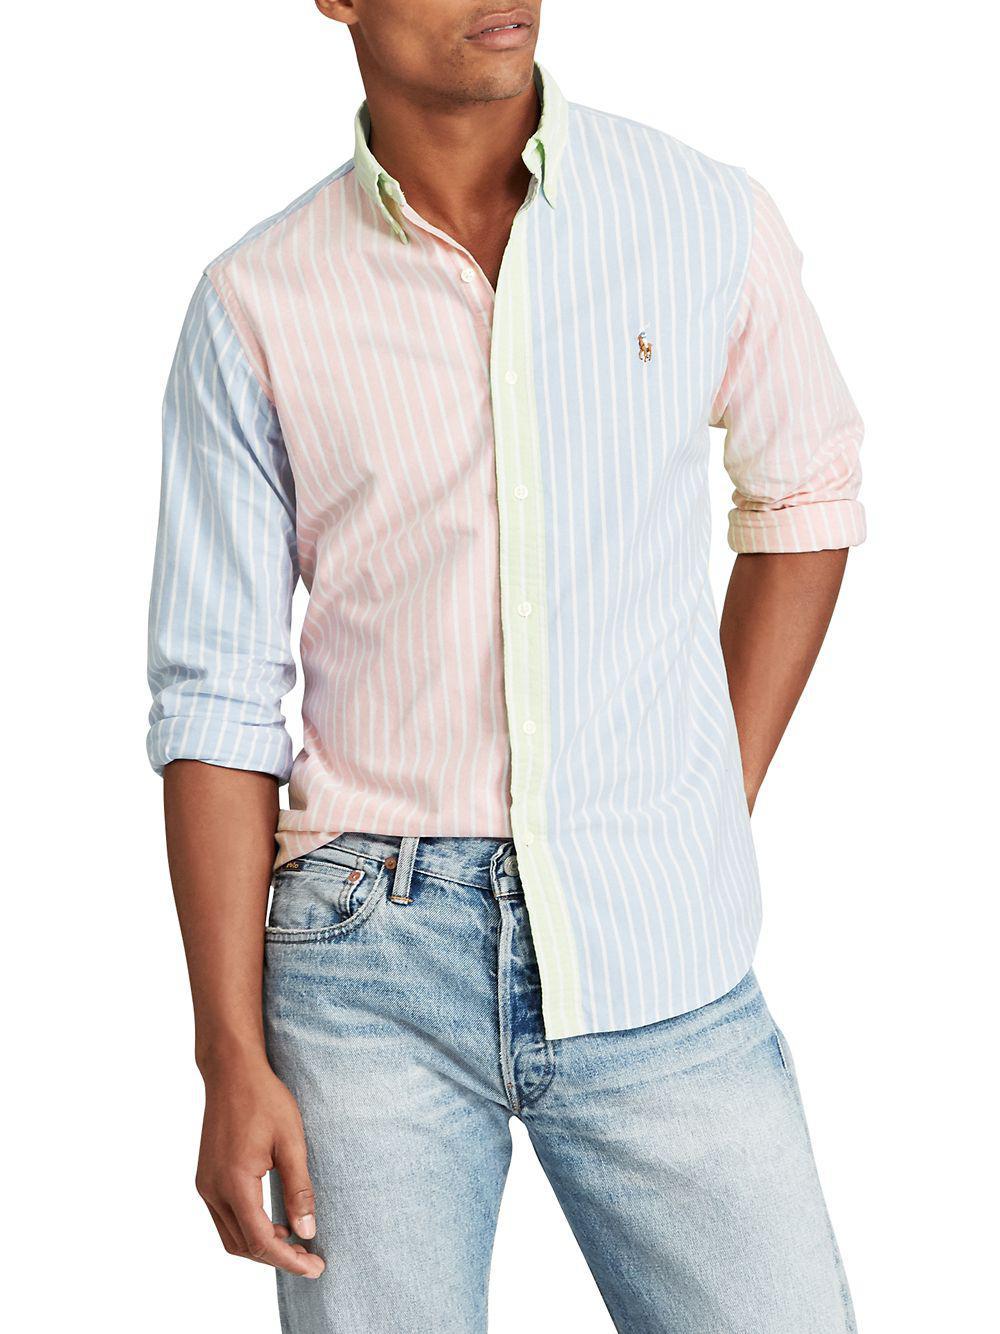 b25a6f3da54 Lyst - Polo Ralph Lauren Classic Oxford Fun Cotton Shirt in Blue for Men